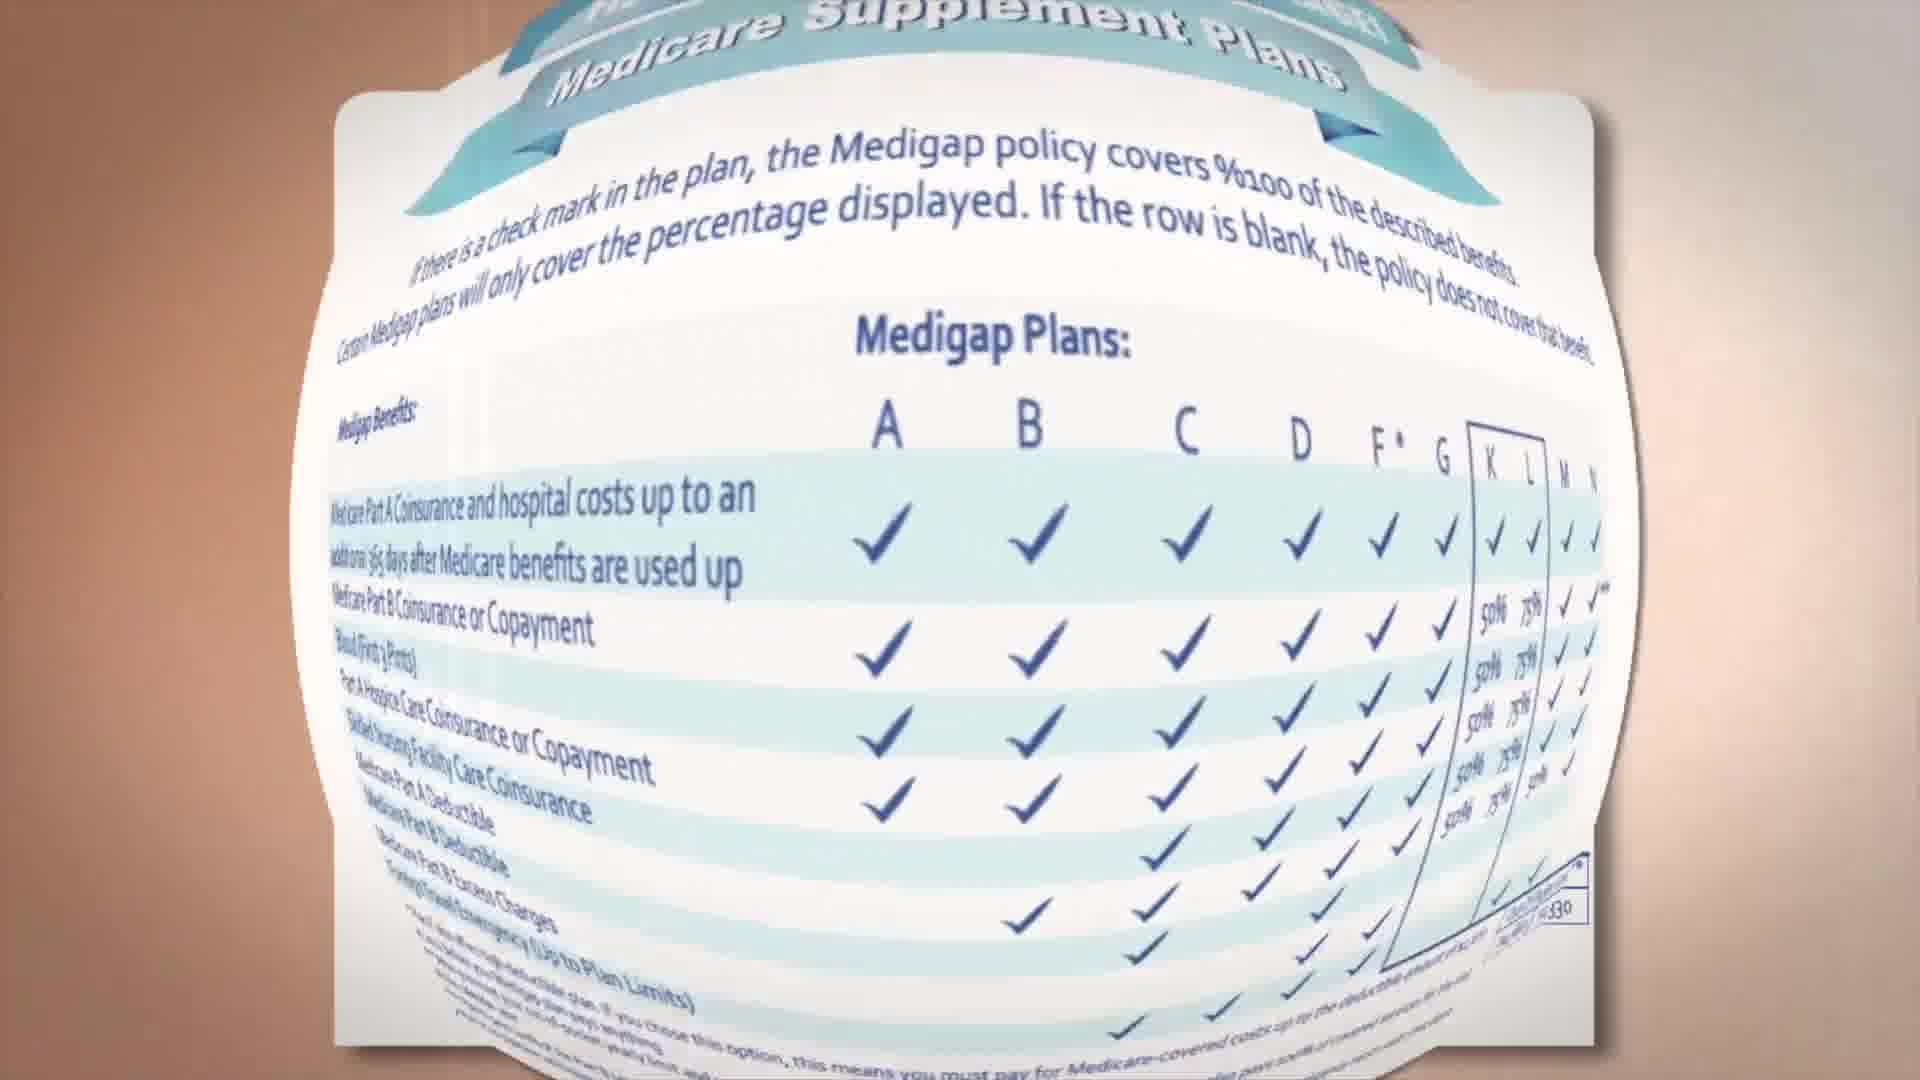 Maximum coverage with medicare and medigap